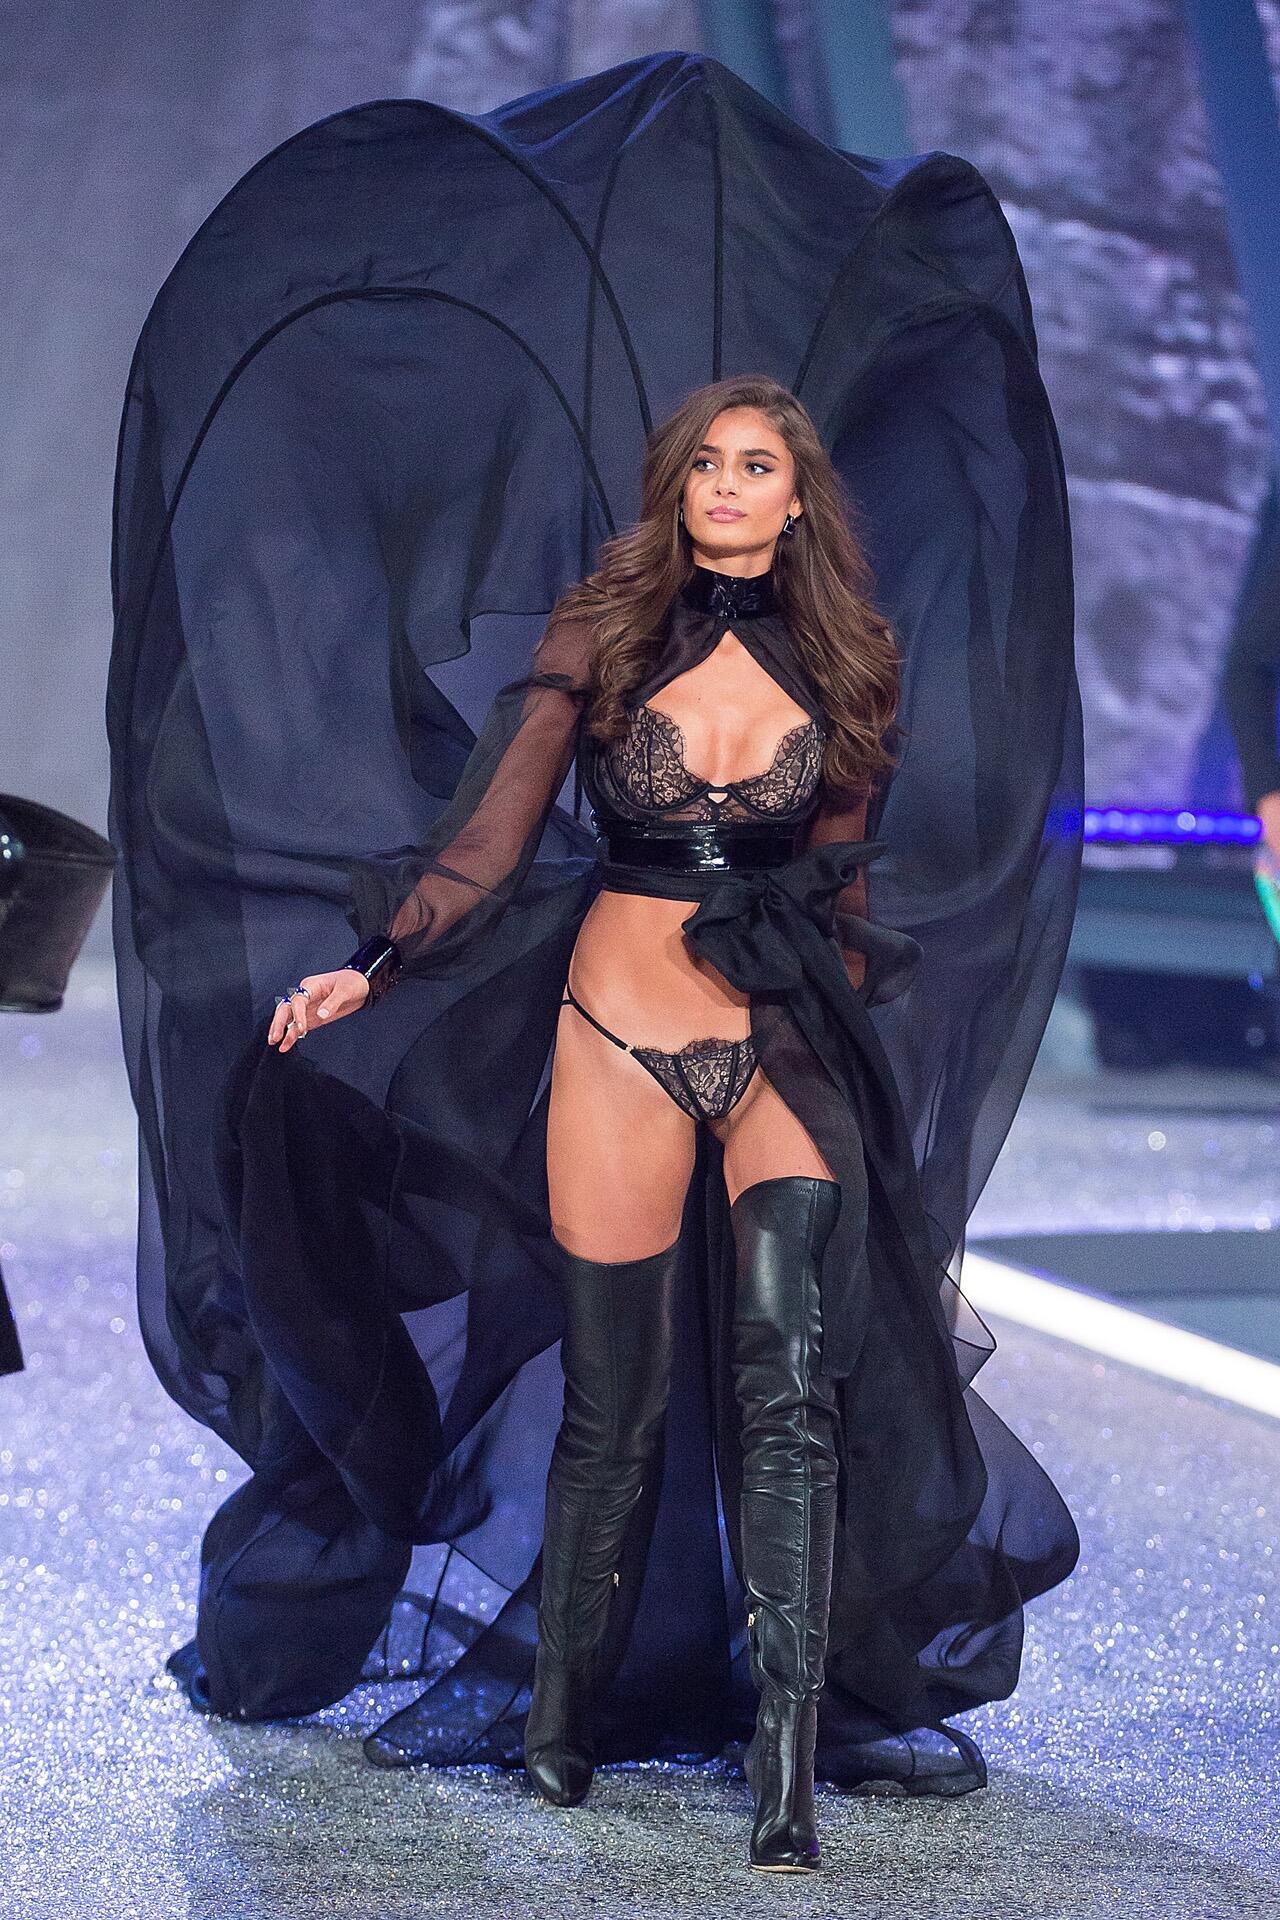 Bild zu Victoria's Secret, Paris 2016, Catwalk, Taylor Hill